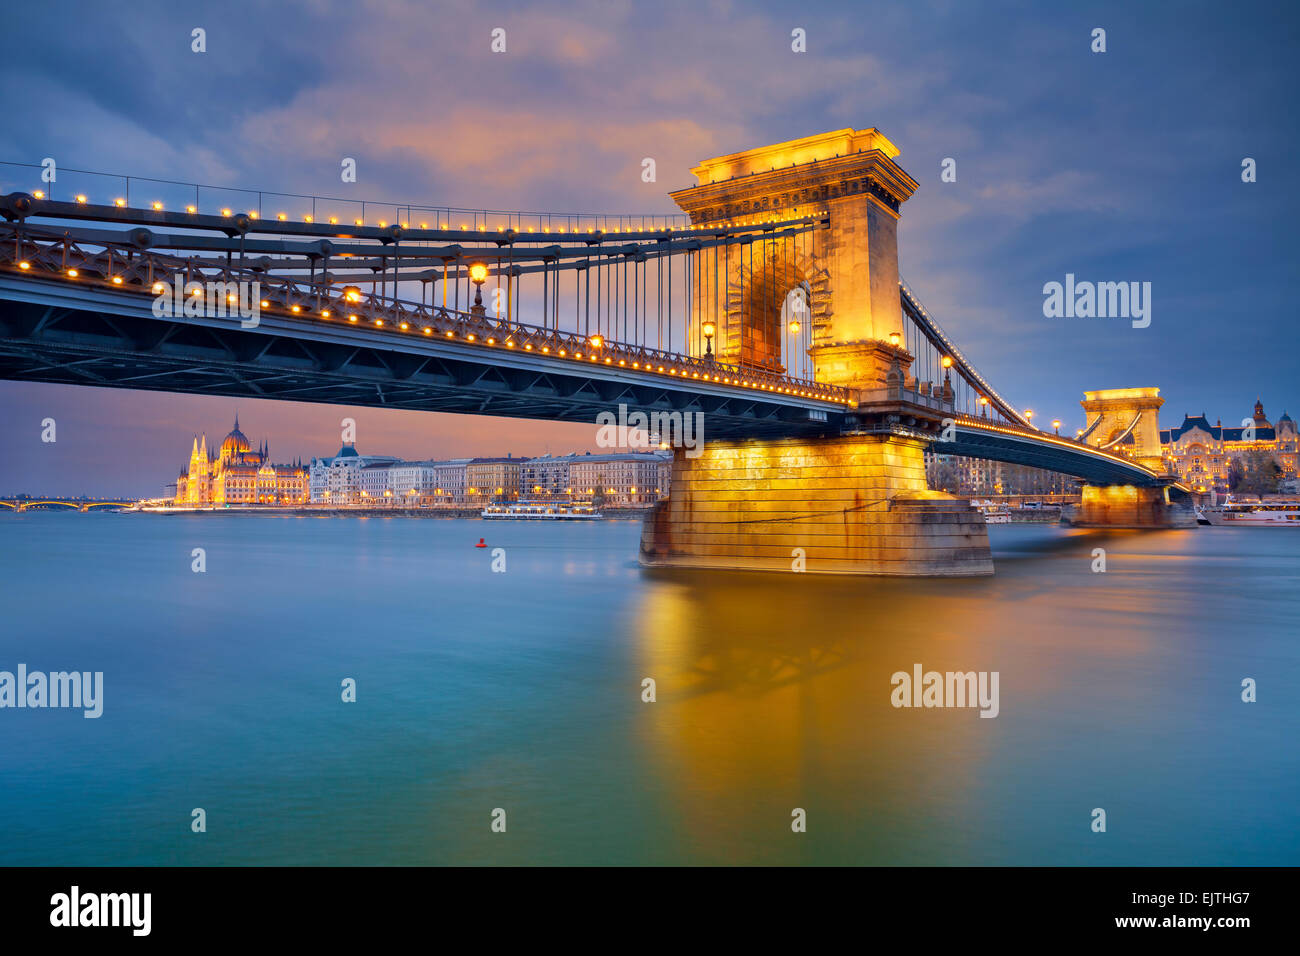 Budapest. Imagen de Budapest, capital de Hungría, durante la hora azul crepúsculo. Imagen De Stock